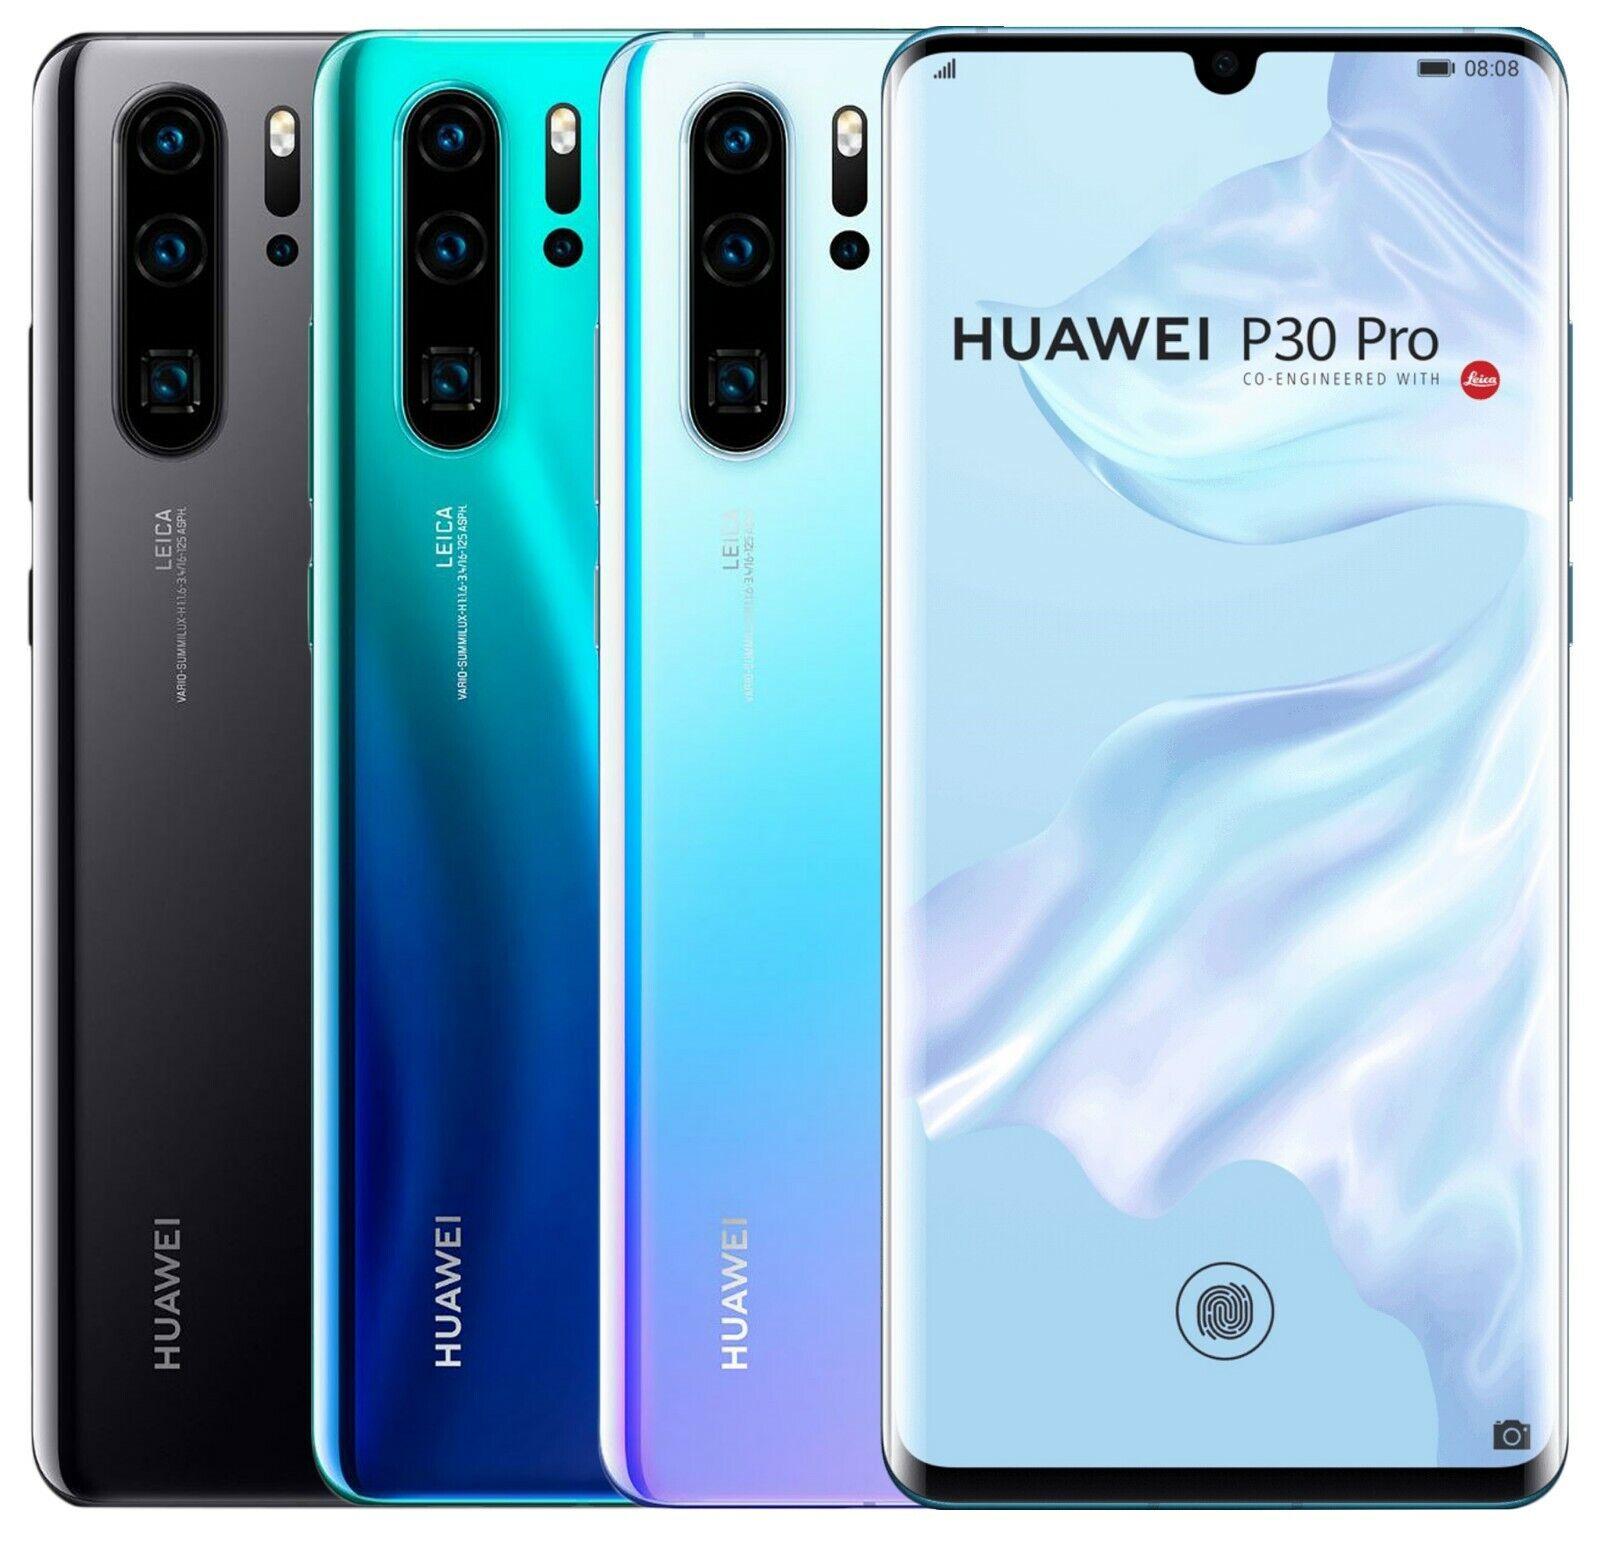 "Huawei P30 Pro 128GB HW-02L (FACTORY UNLOCKED) 6.47"" 6GB RAM 40MP"